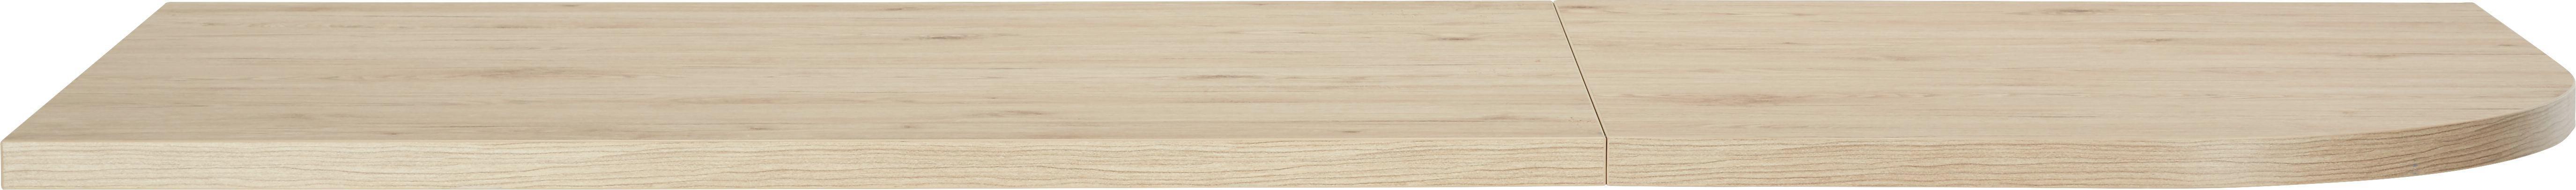 Íróasztallap Massiccio - tölgy színű, modern, fa (120/70-76/80cm) - BASED